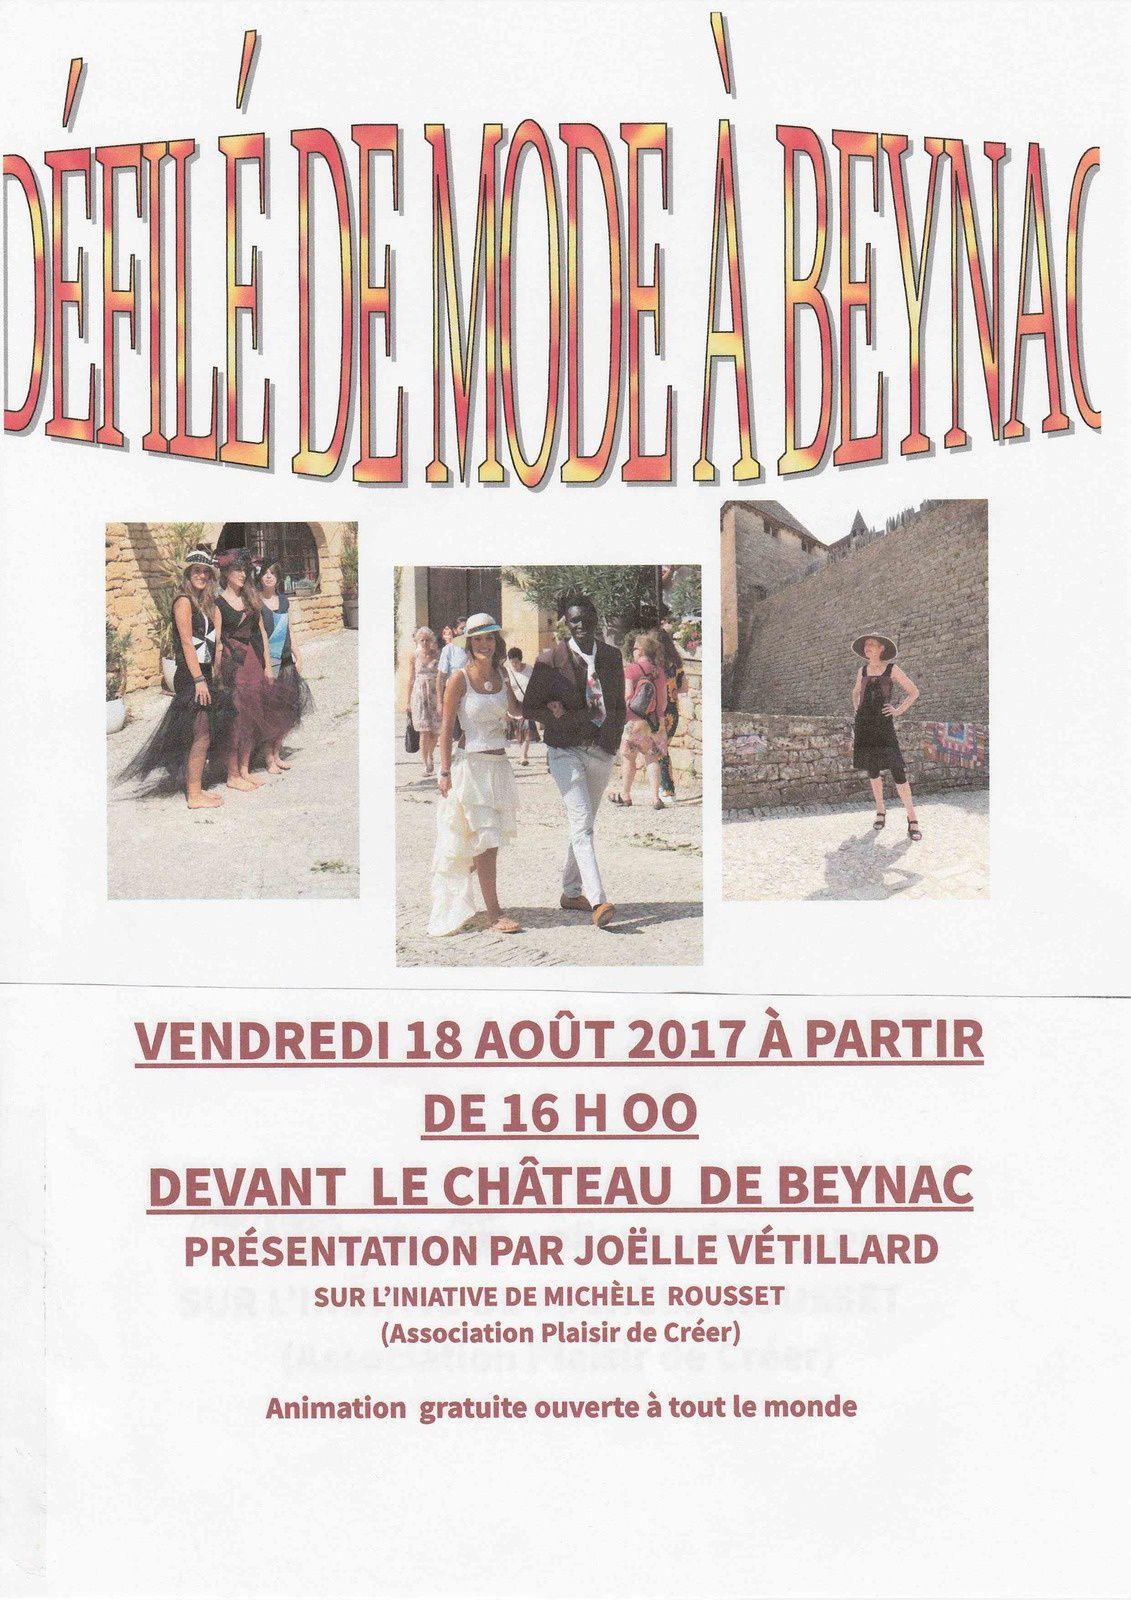 Défilé de Mode Beynac en Dordogne 2017